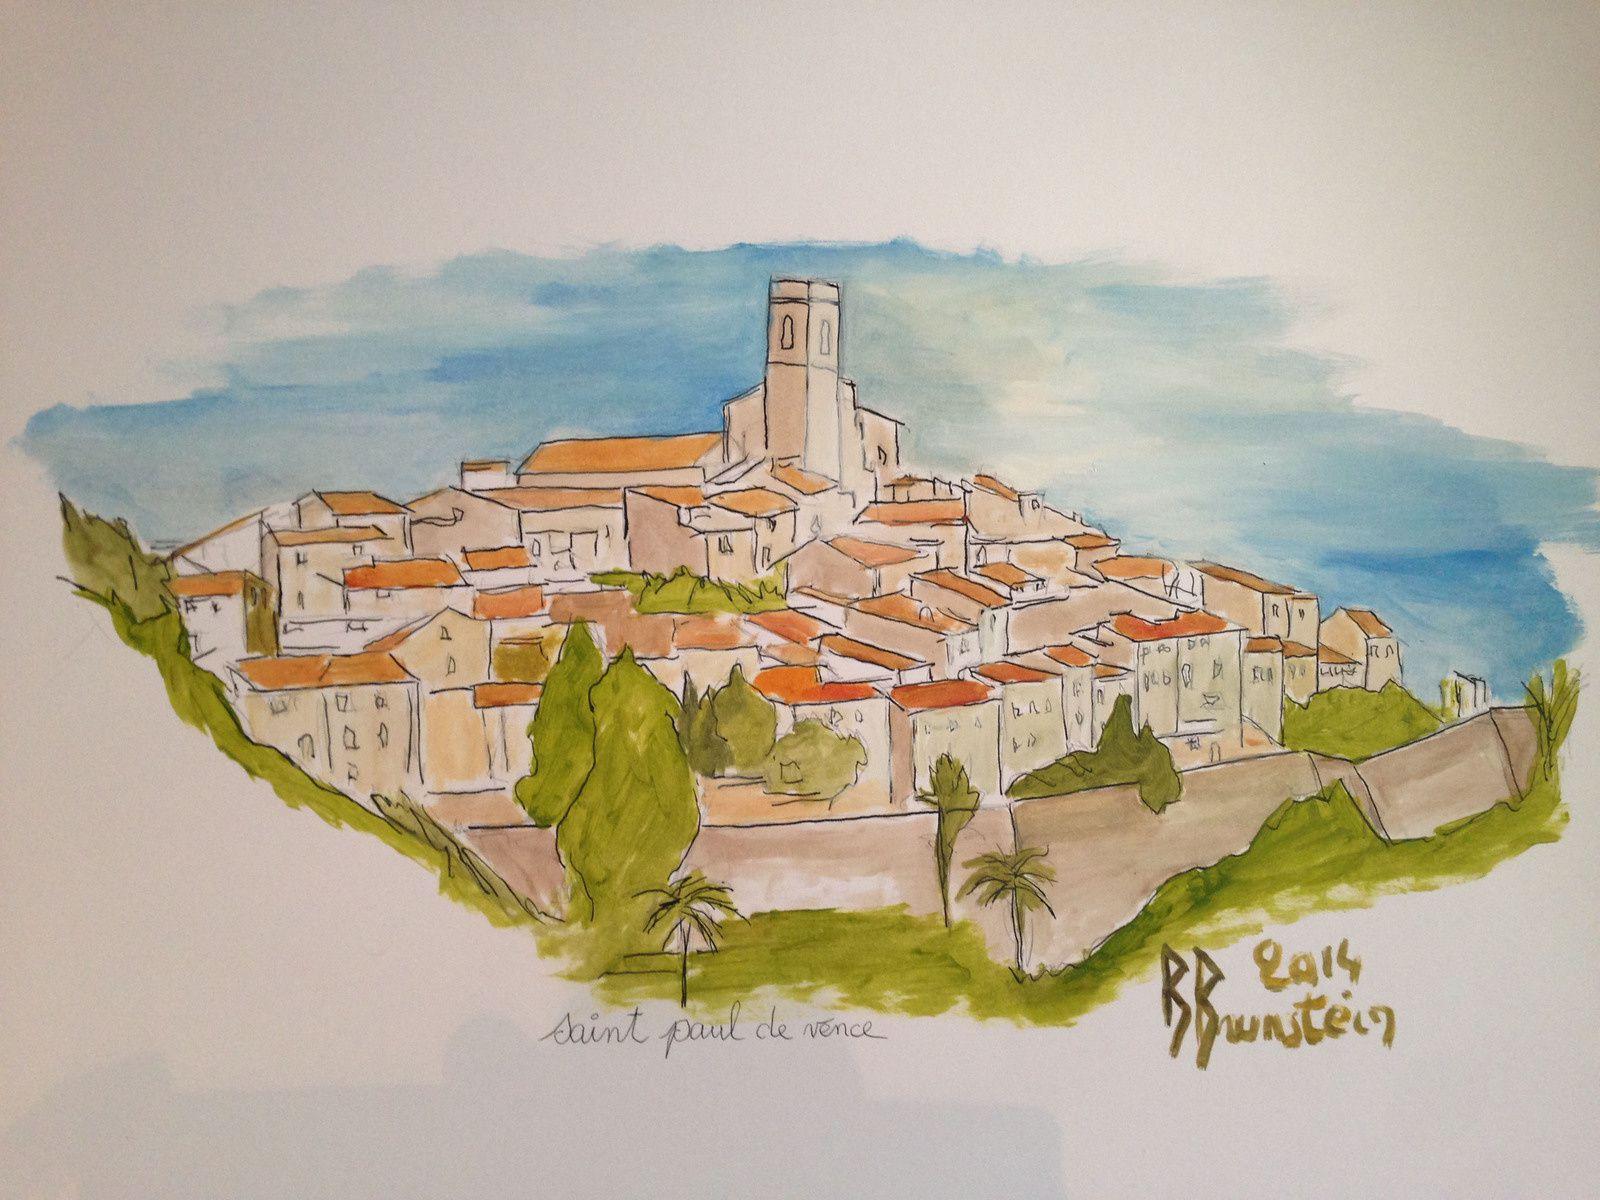 Saint-Paul-de-Vence  -  Bernard Brunstein